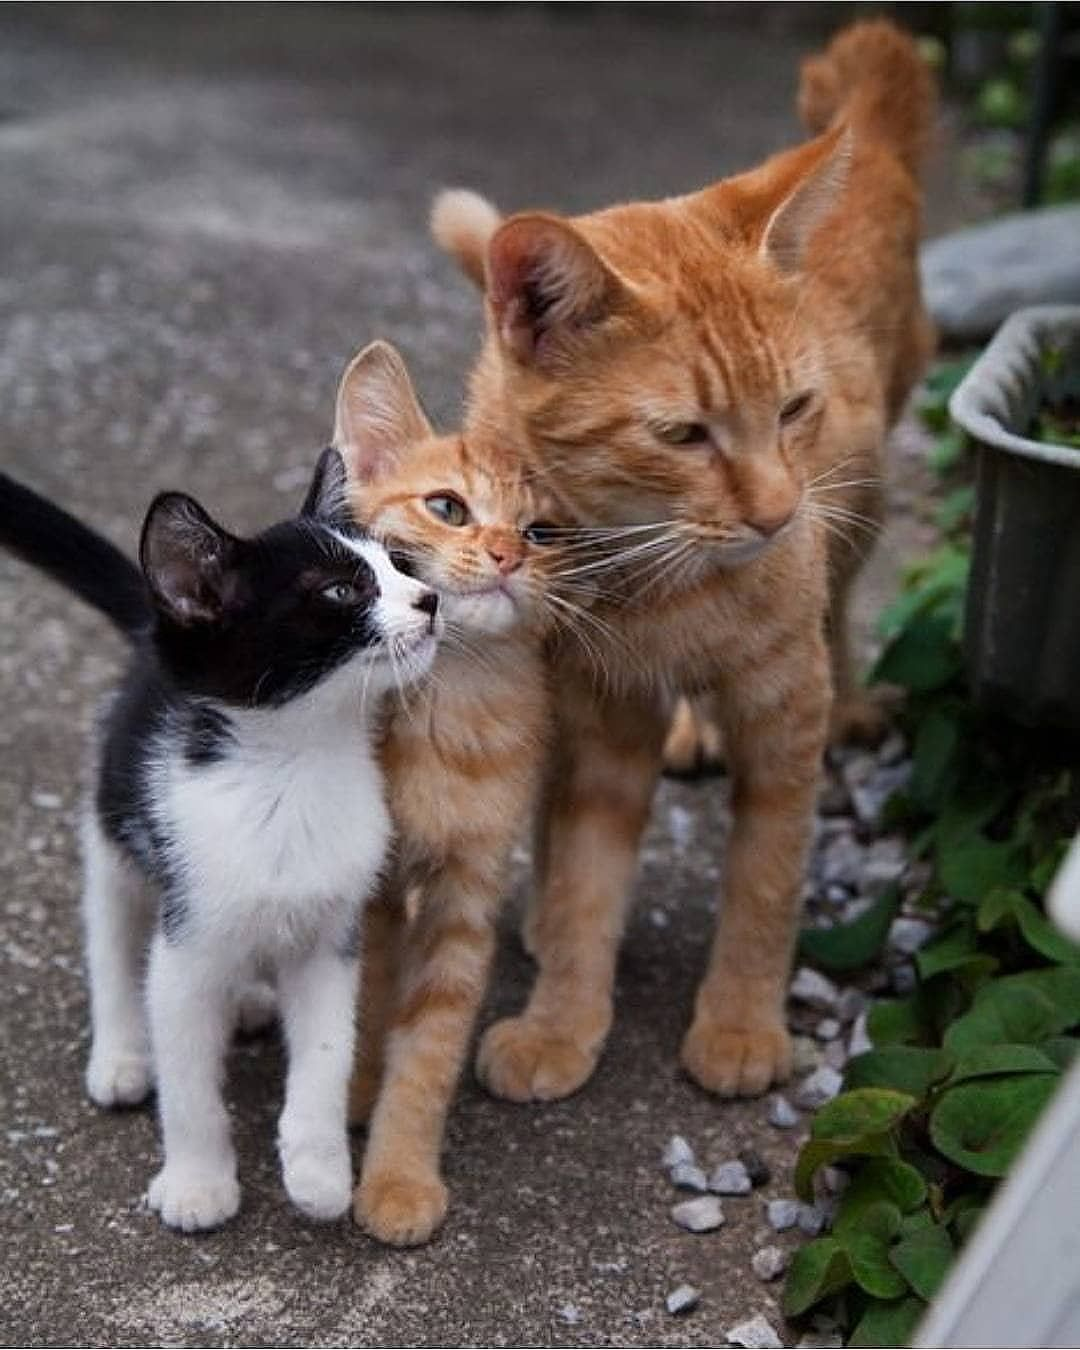 Polubienia 3 014 Komentarze 26 My Dreamy Cats Mydreamycats Na Instagramie Follow Us Mydreamycat In 2020 Cute Baby Animals Cute Cats And Kittens Cute Animals